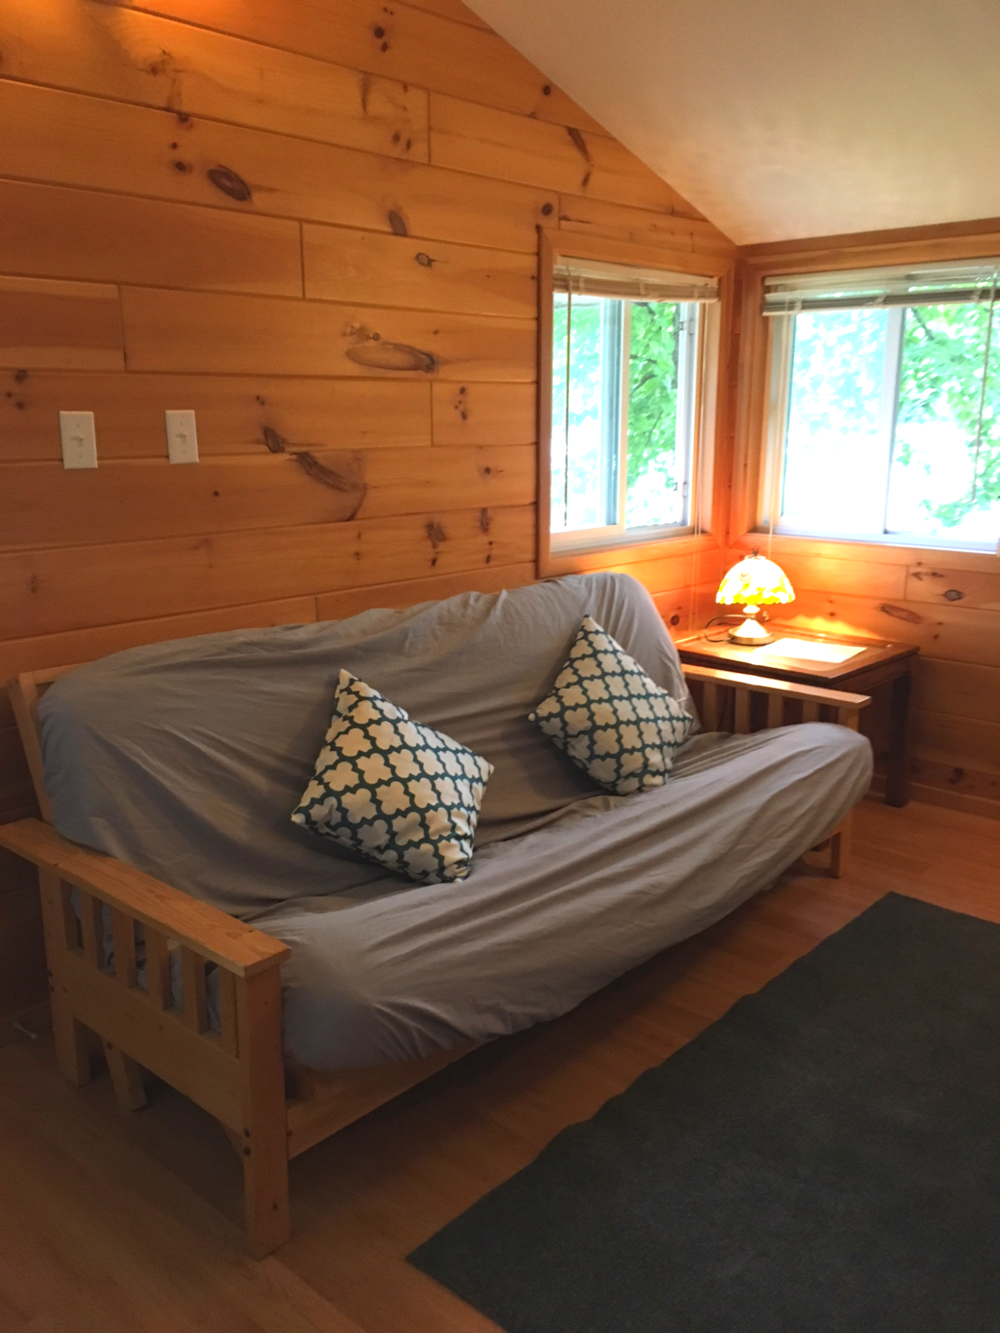 2 Bedroom Max capacityfor two bedrooms 4 (+1) 1 Night Stay: $189 Summer Season 2 Nights Package: $350 Additional Nights: $135 Long Weekends (3 nights minimum) : $495 Weekly Rate (7 days) : $995